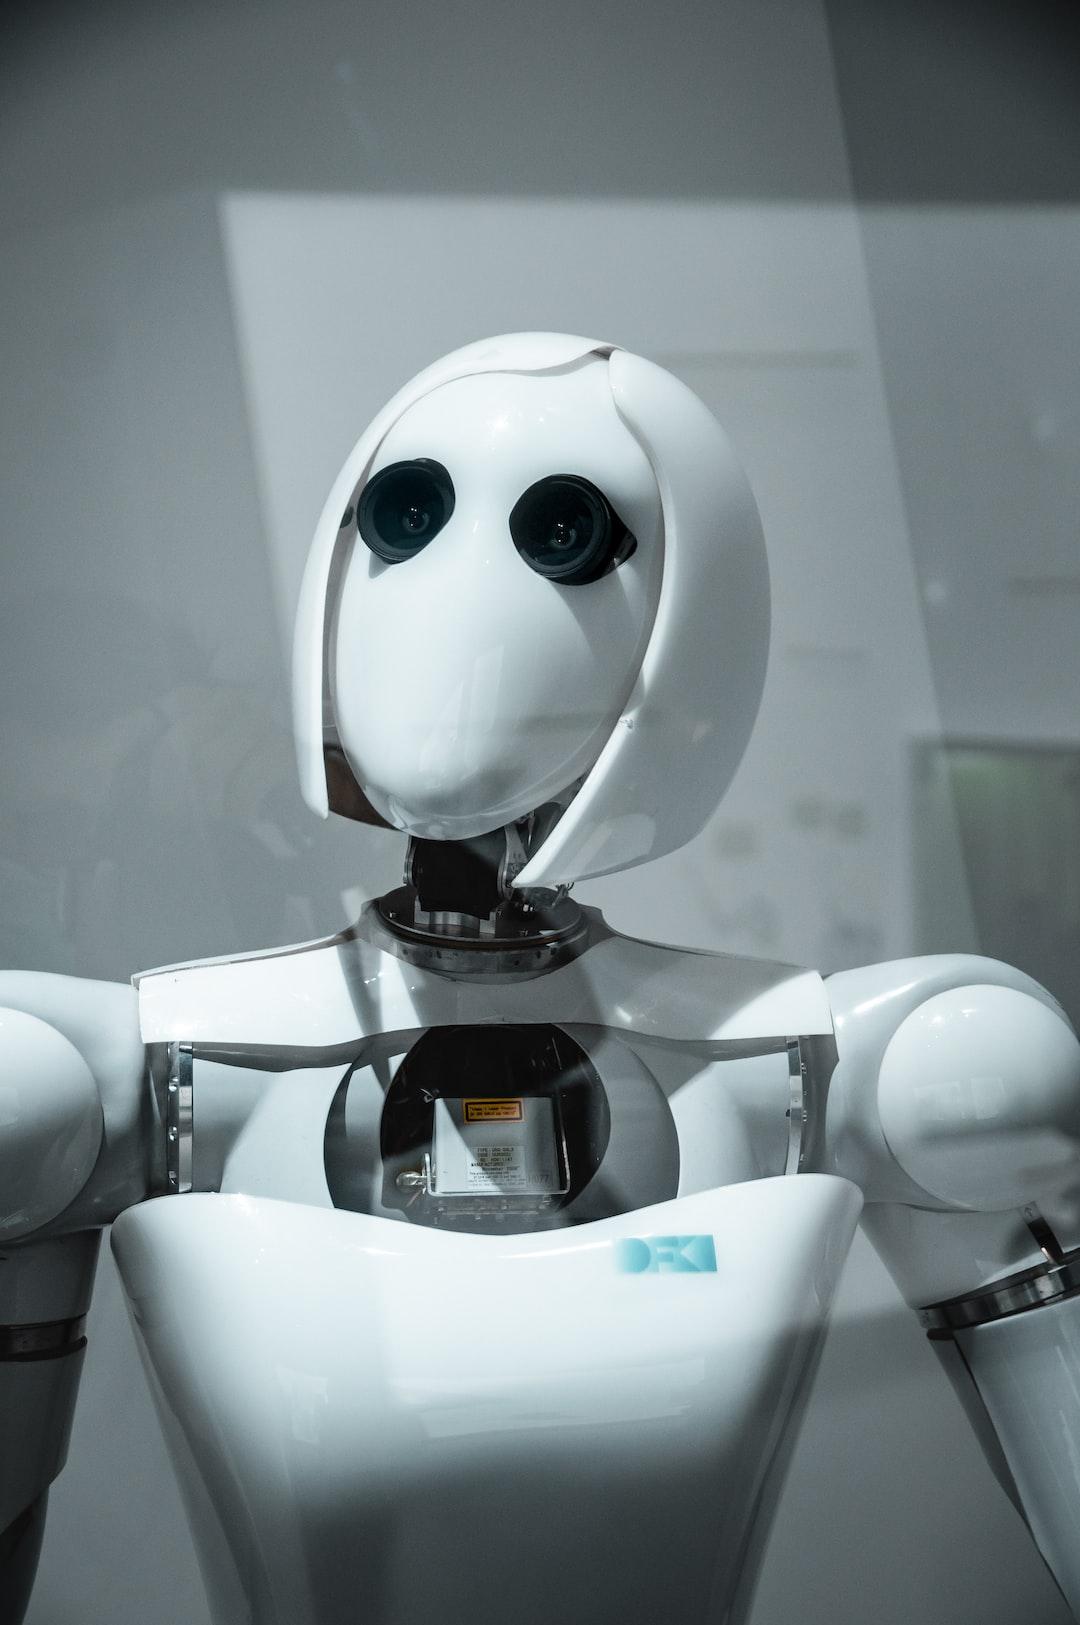 the humanoid AI powered robot AILA of DFKI displayed at Futurium in Berlin